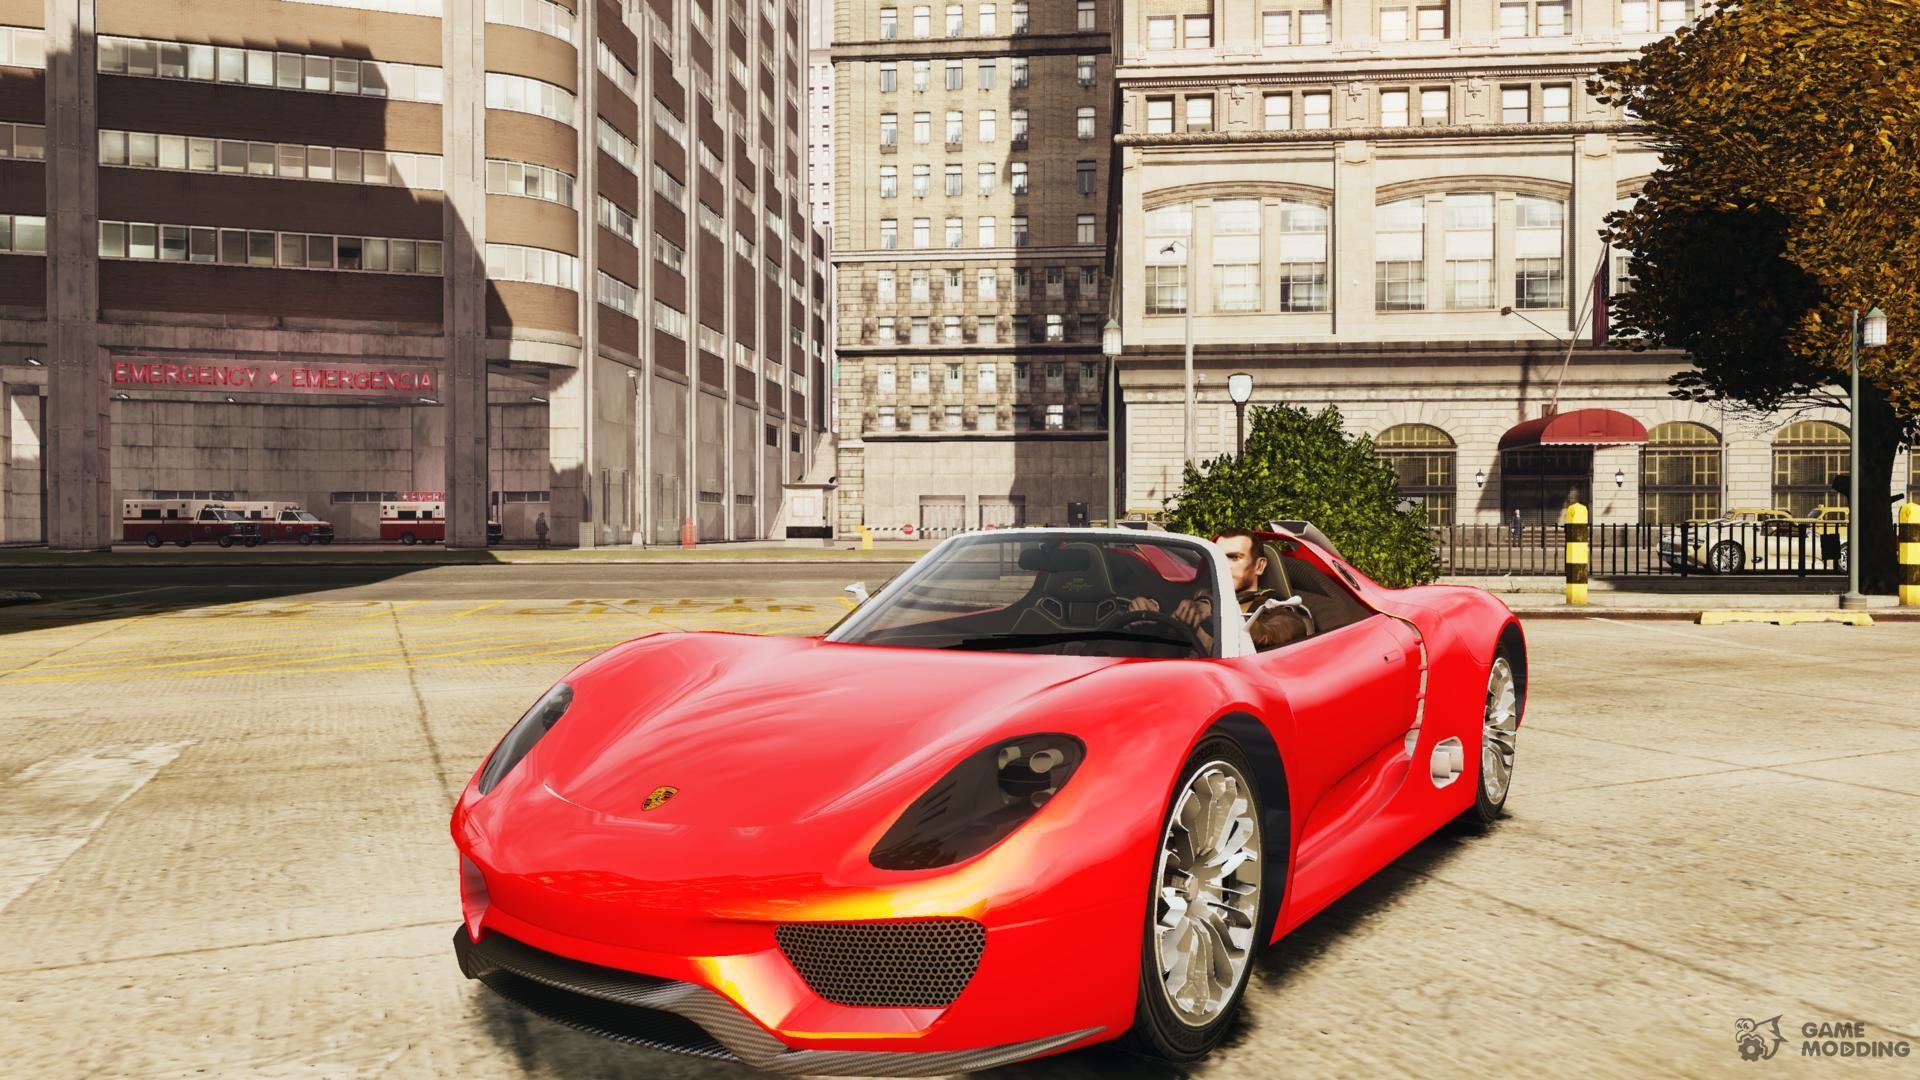 1242580cac7590cd40f2905b05283516ef85ec7e7beb7620e924b8ec8ecca045 Fabulous Porsche 918 Spyder Nfs Mw Mod Cars Trend